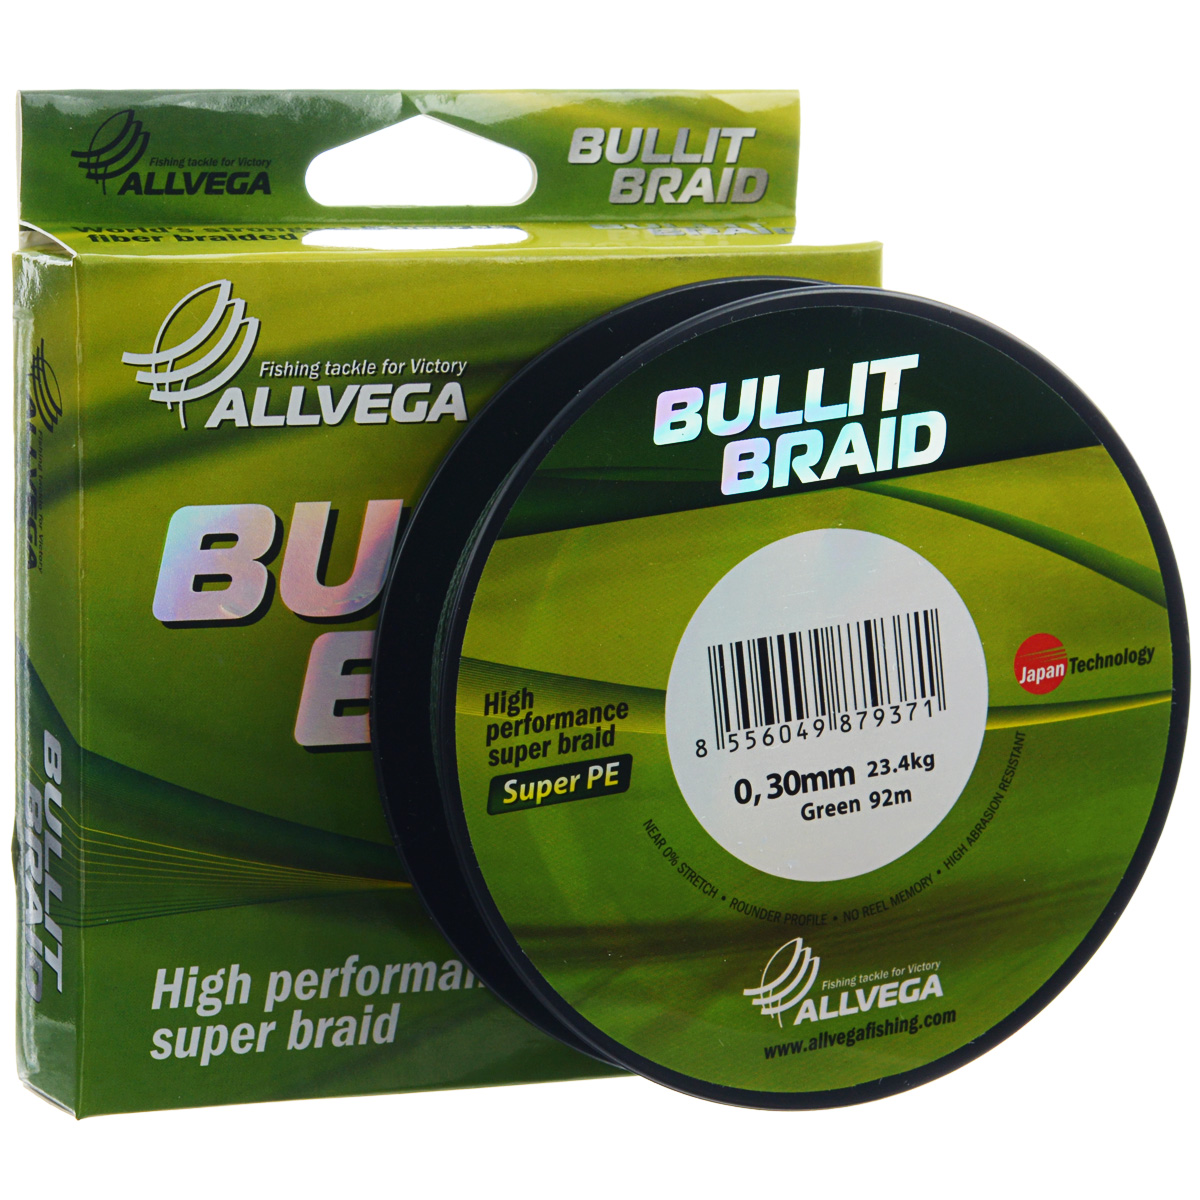 Леска плетеная Allvega Bullit Braid, цвет: темно-зеленый, 92 м, 0,3 мм, 23,4 кг